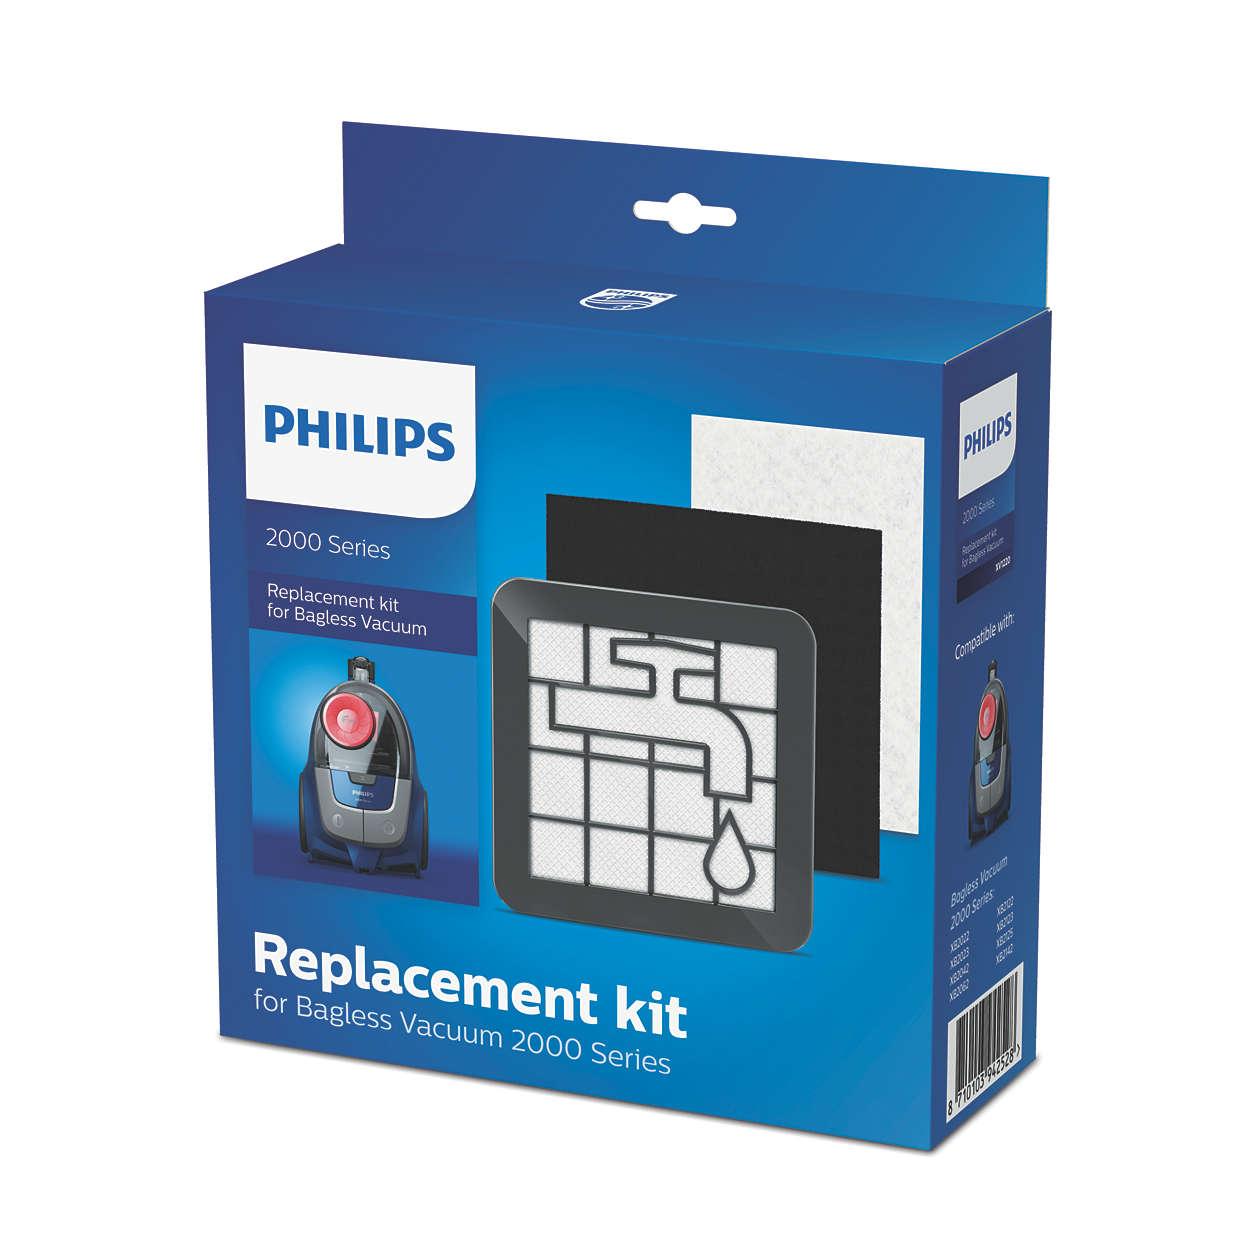 Replacement kit for Bagless Vacuum 2000 Series*